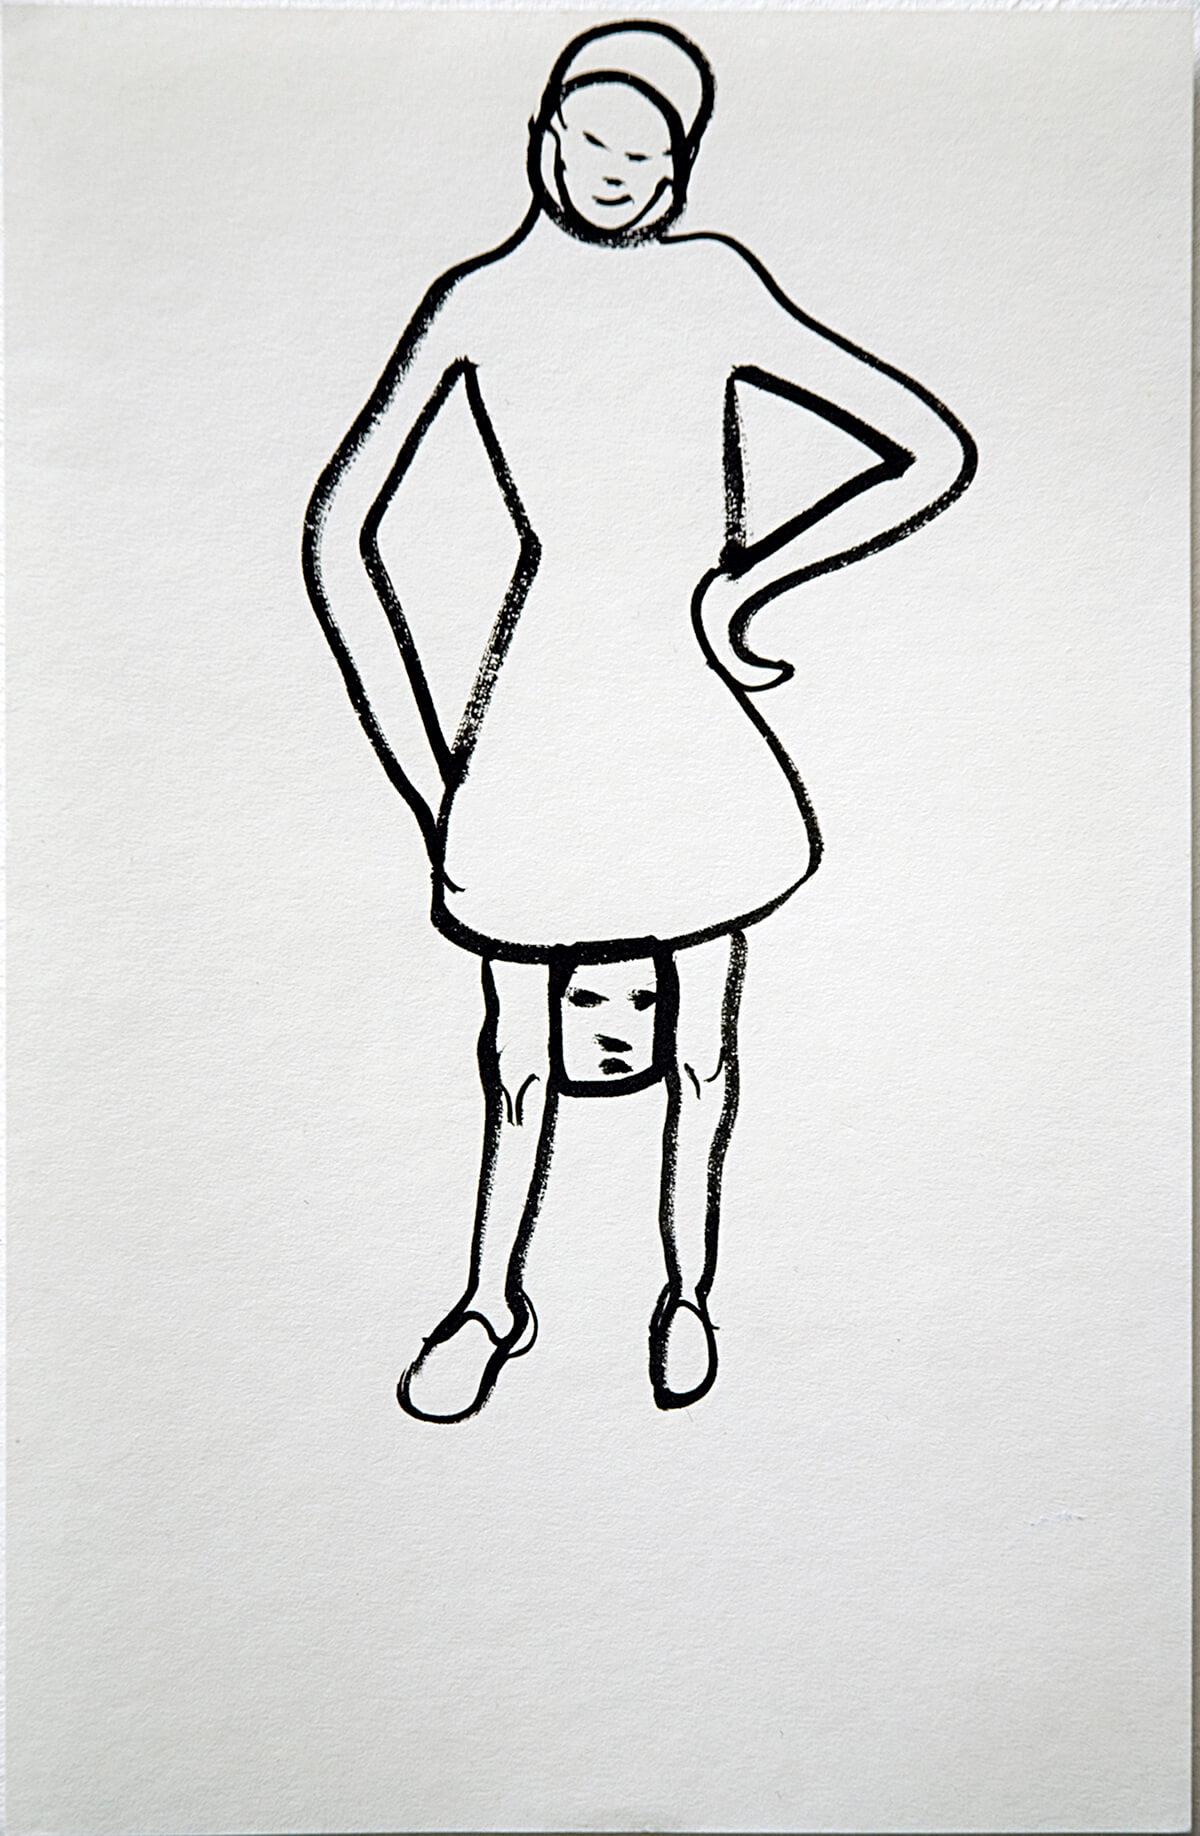 untitled (head between knees), 23 x 15 cm, ink on paper, 2011